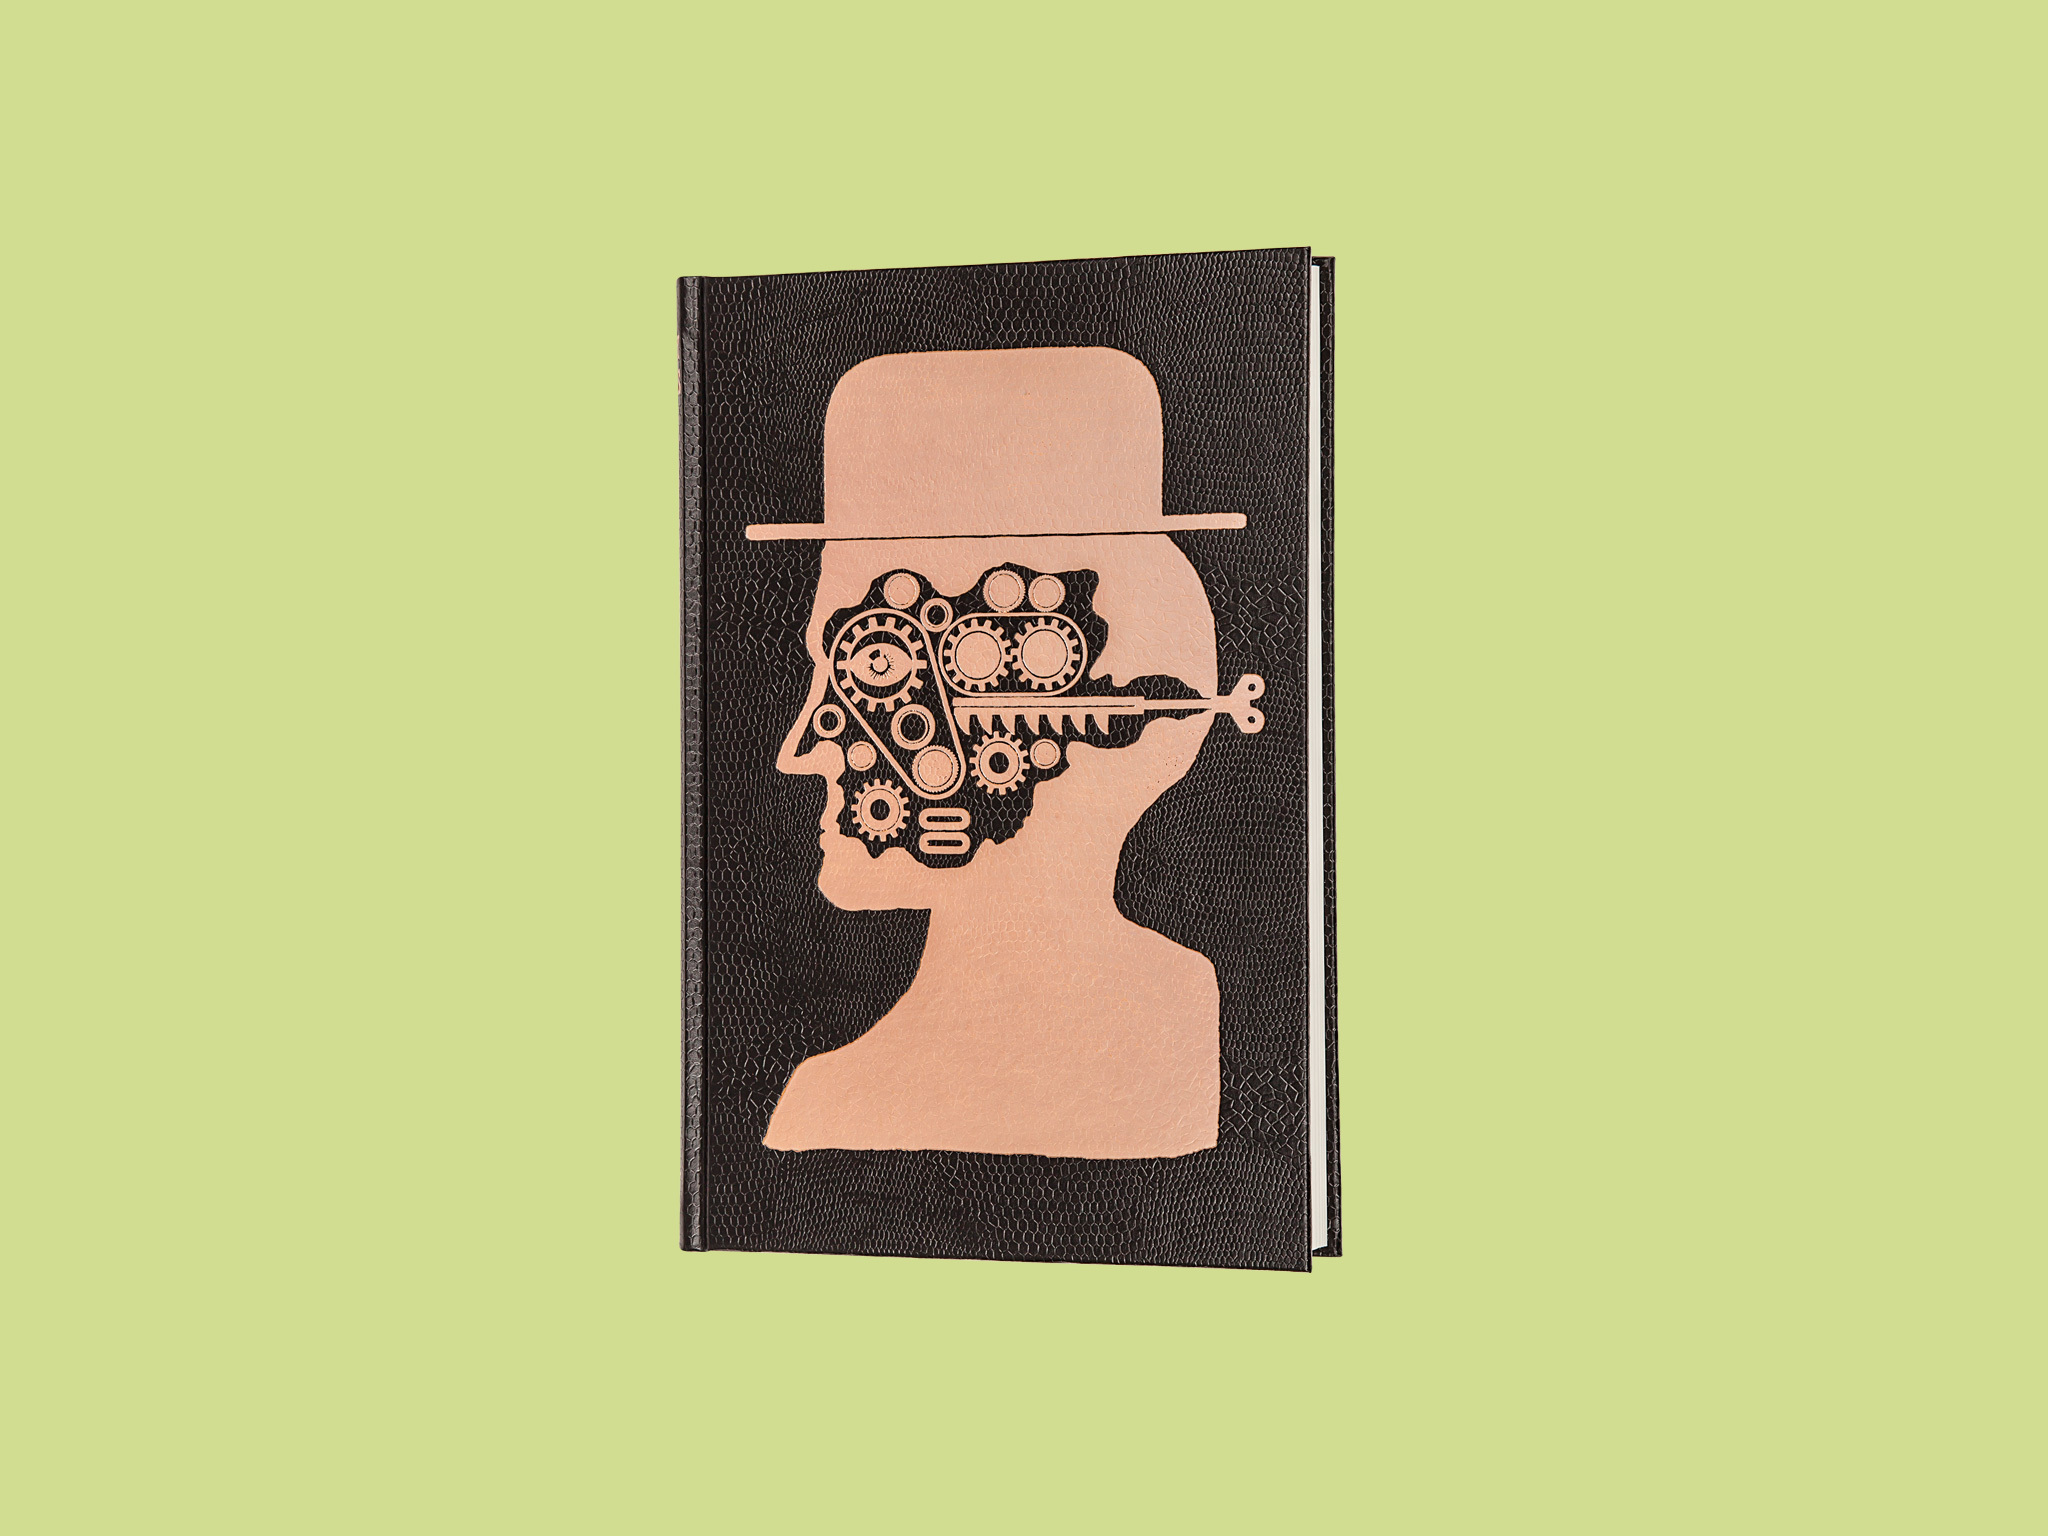 'A Clockwork Orange' by Anthony Burgess